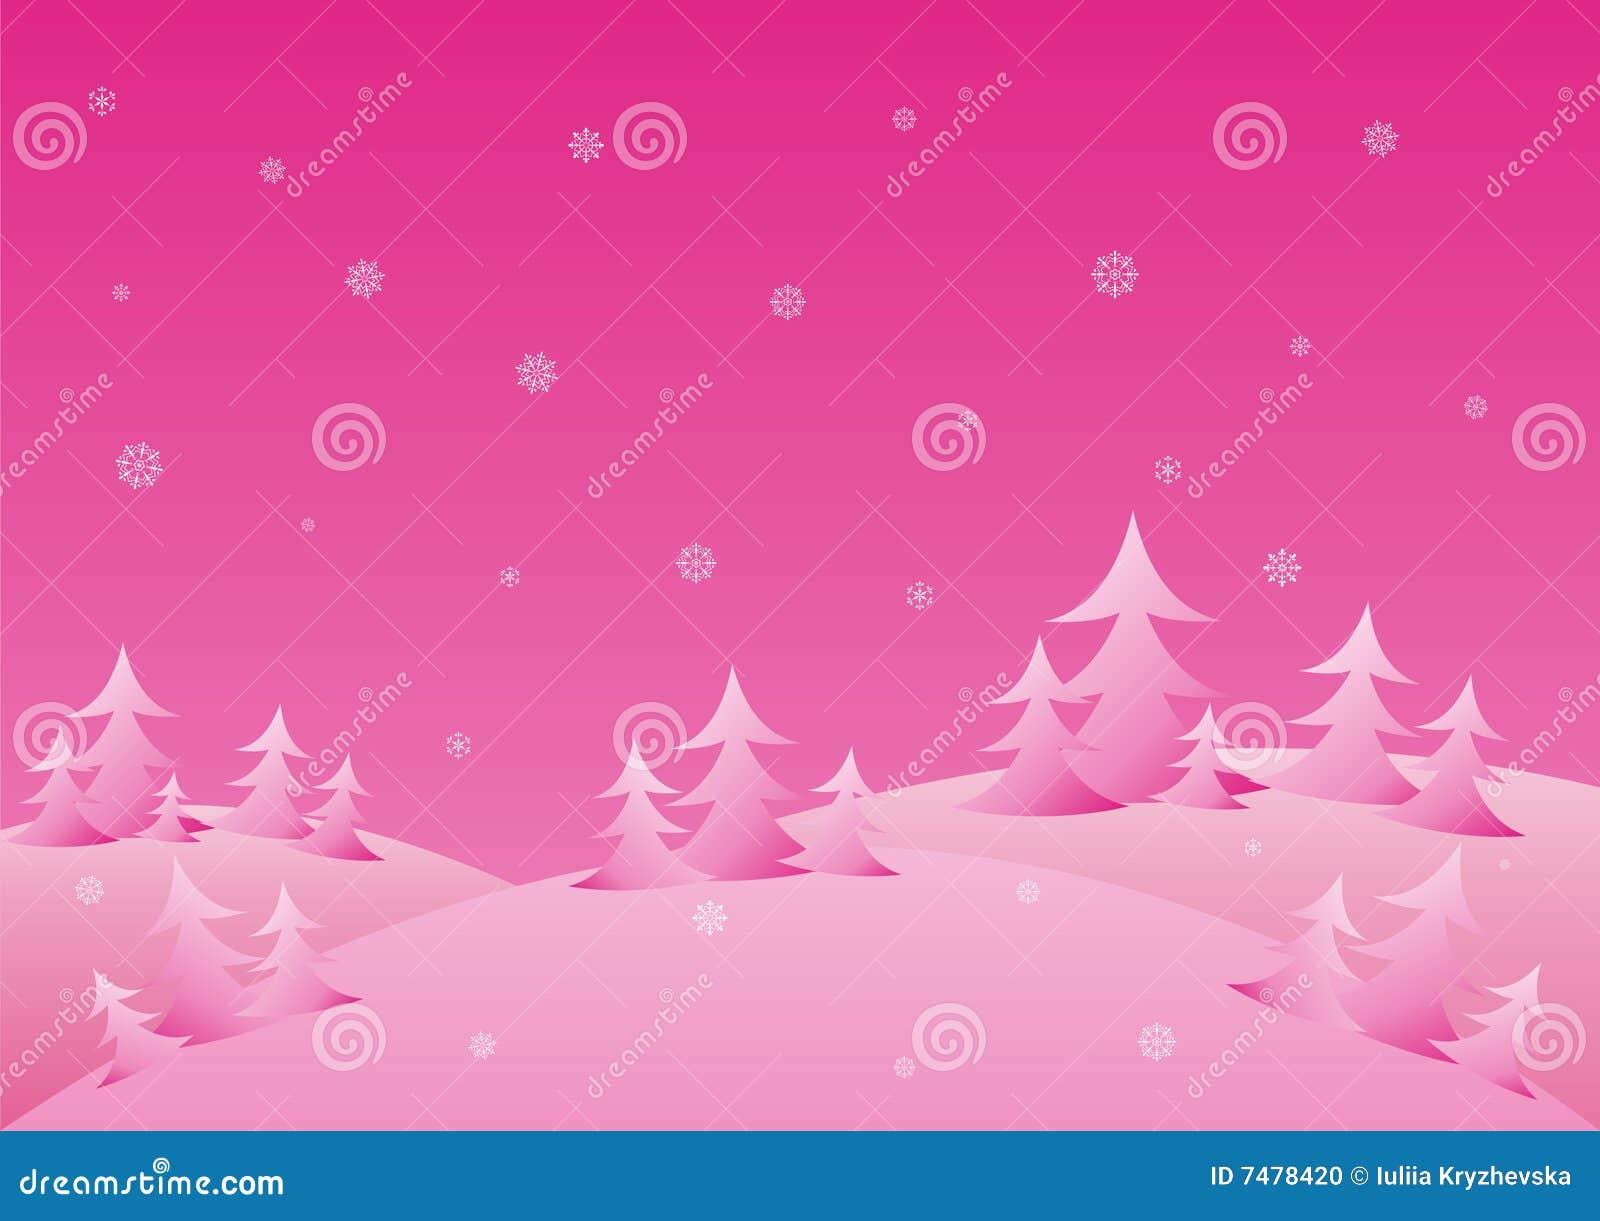 Pink Winter Background Stock Photo - Image: 7478420